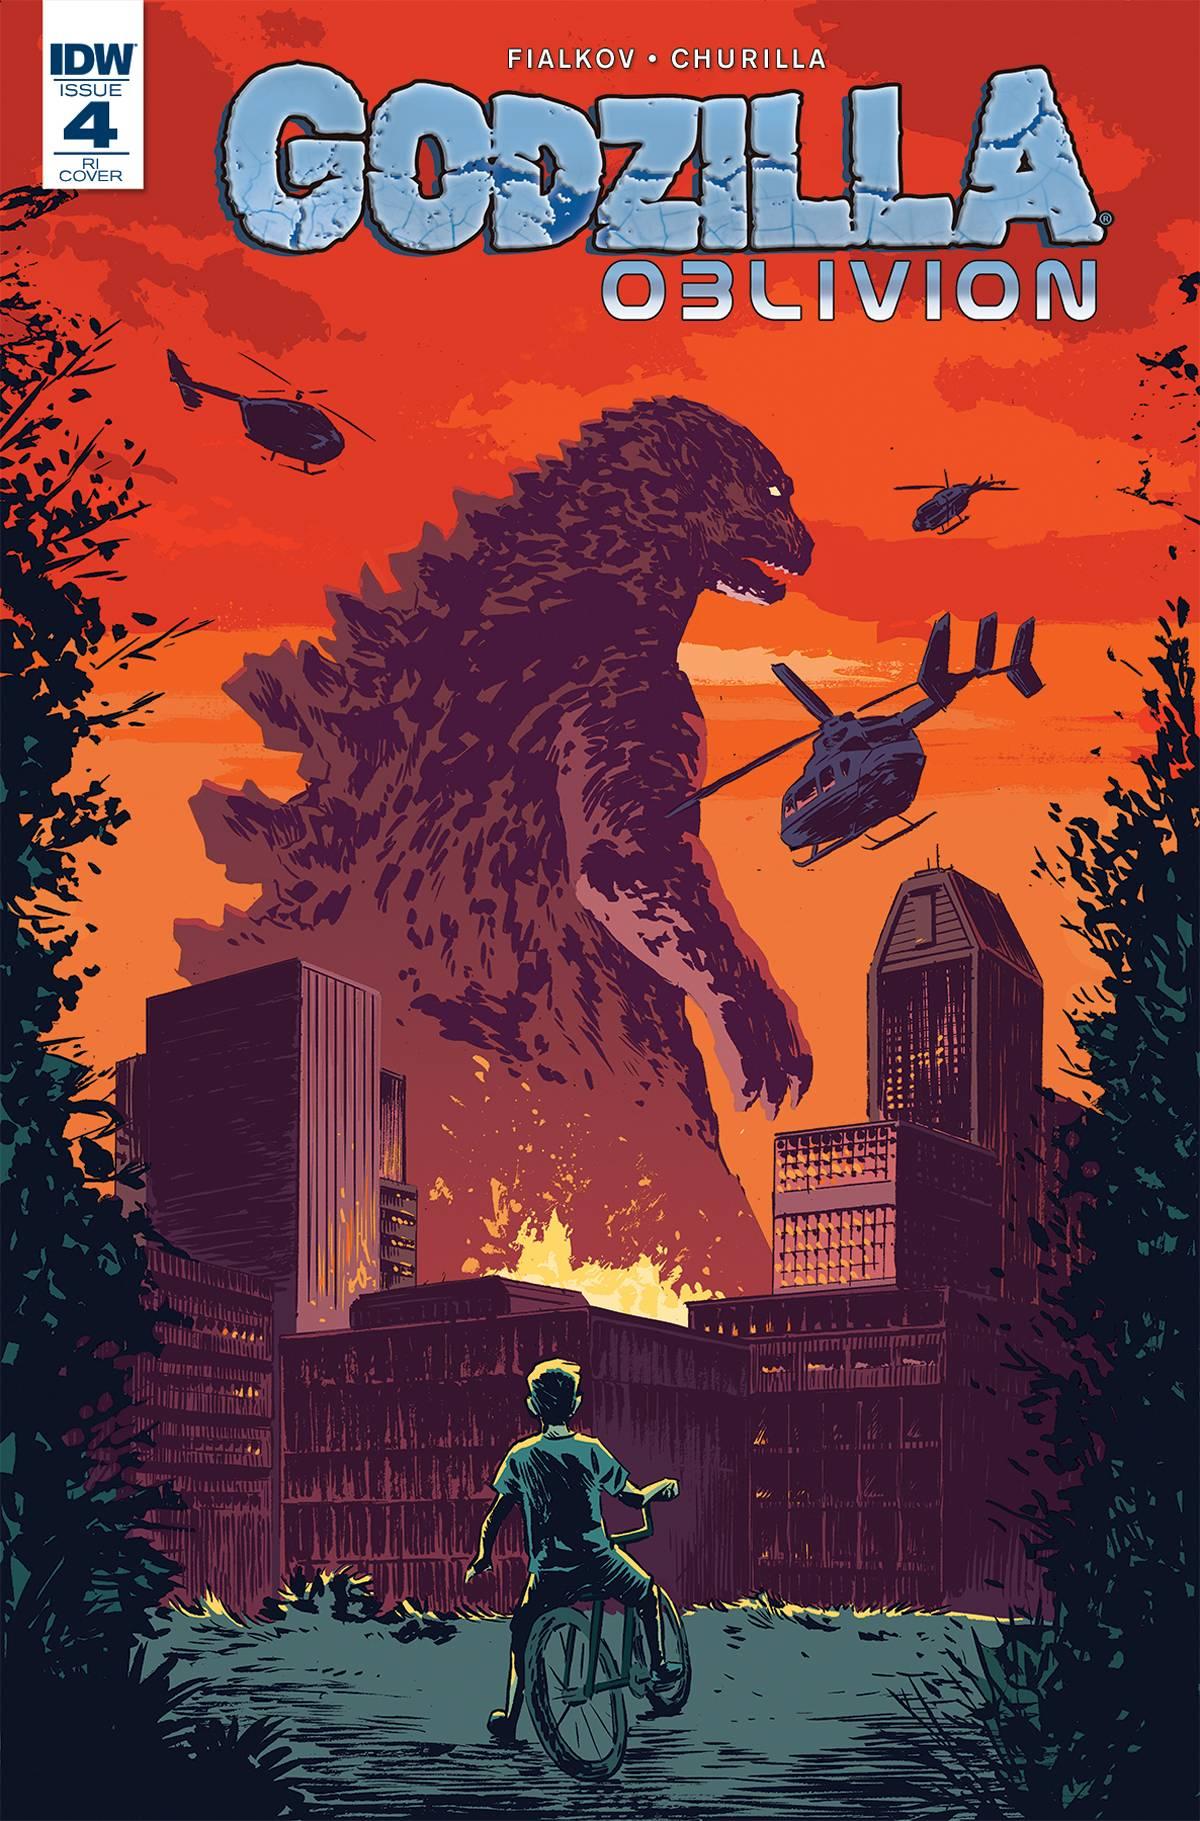 GODZILLA OBLIVION #4 Michael Walsh Variant Cover